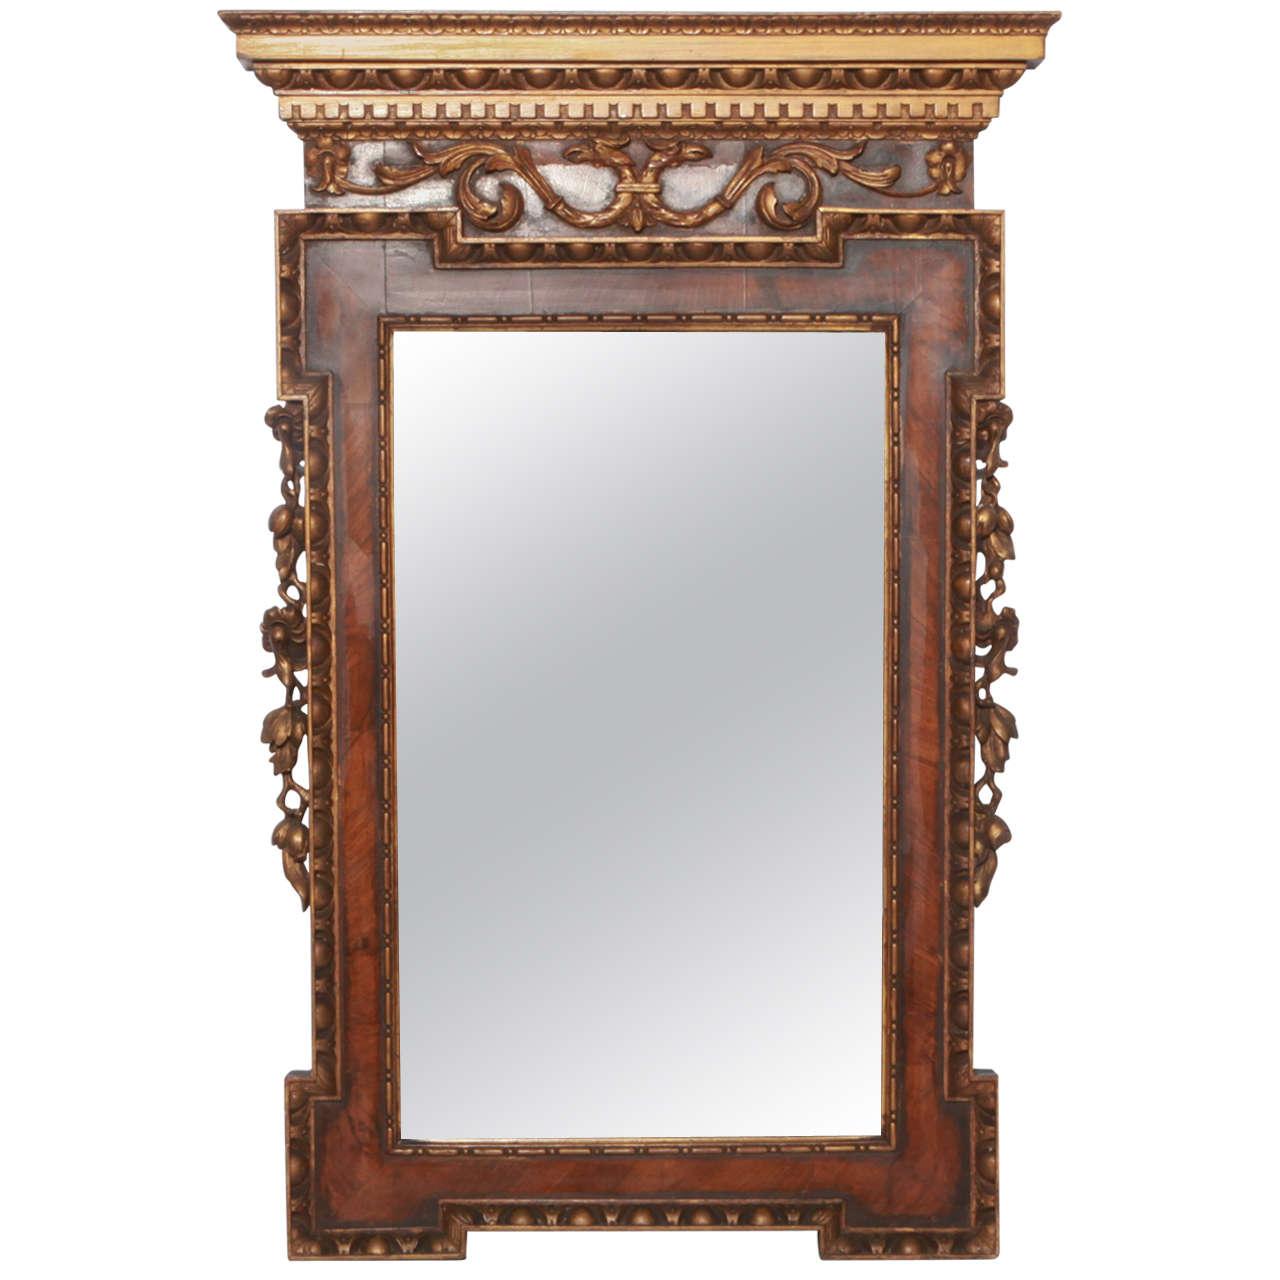 20th Century English William Kent Style Mirror